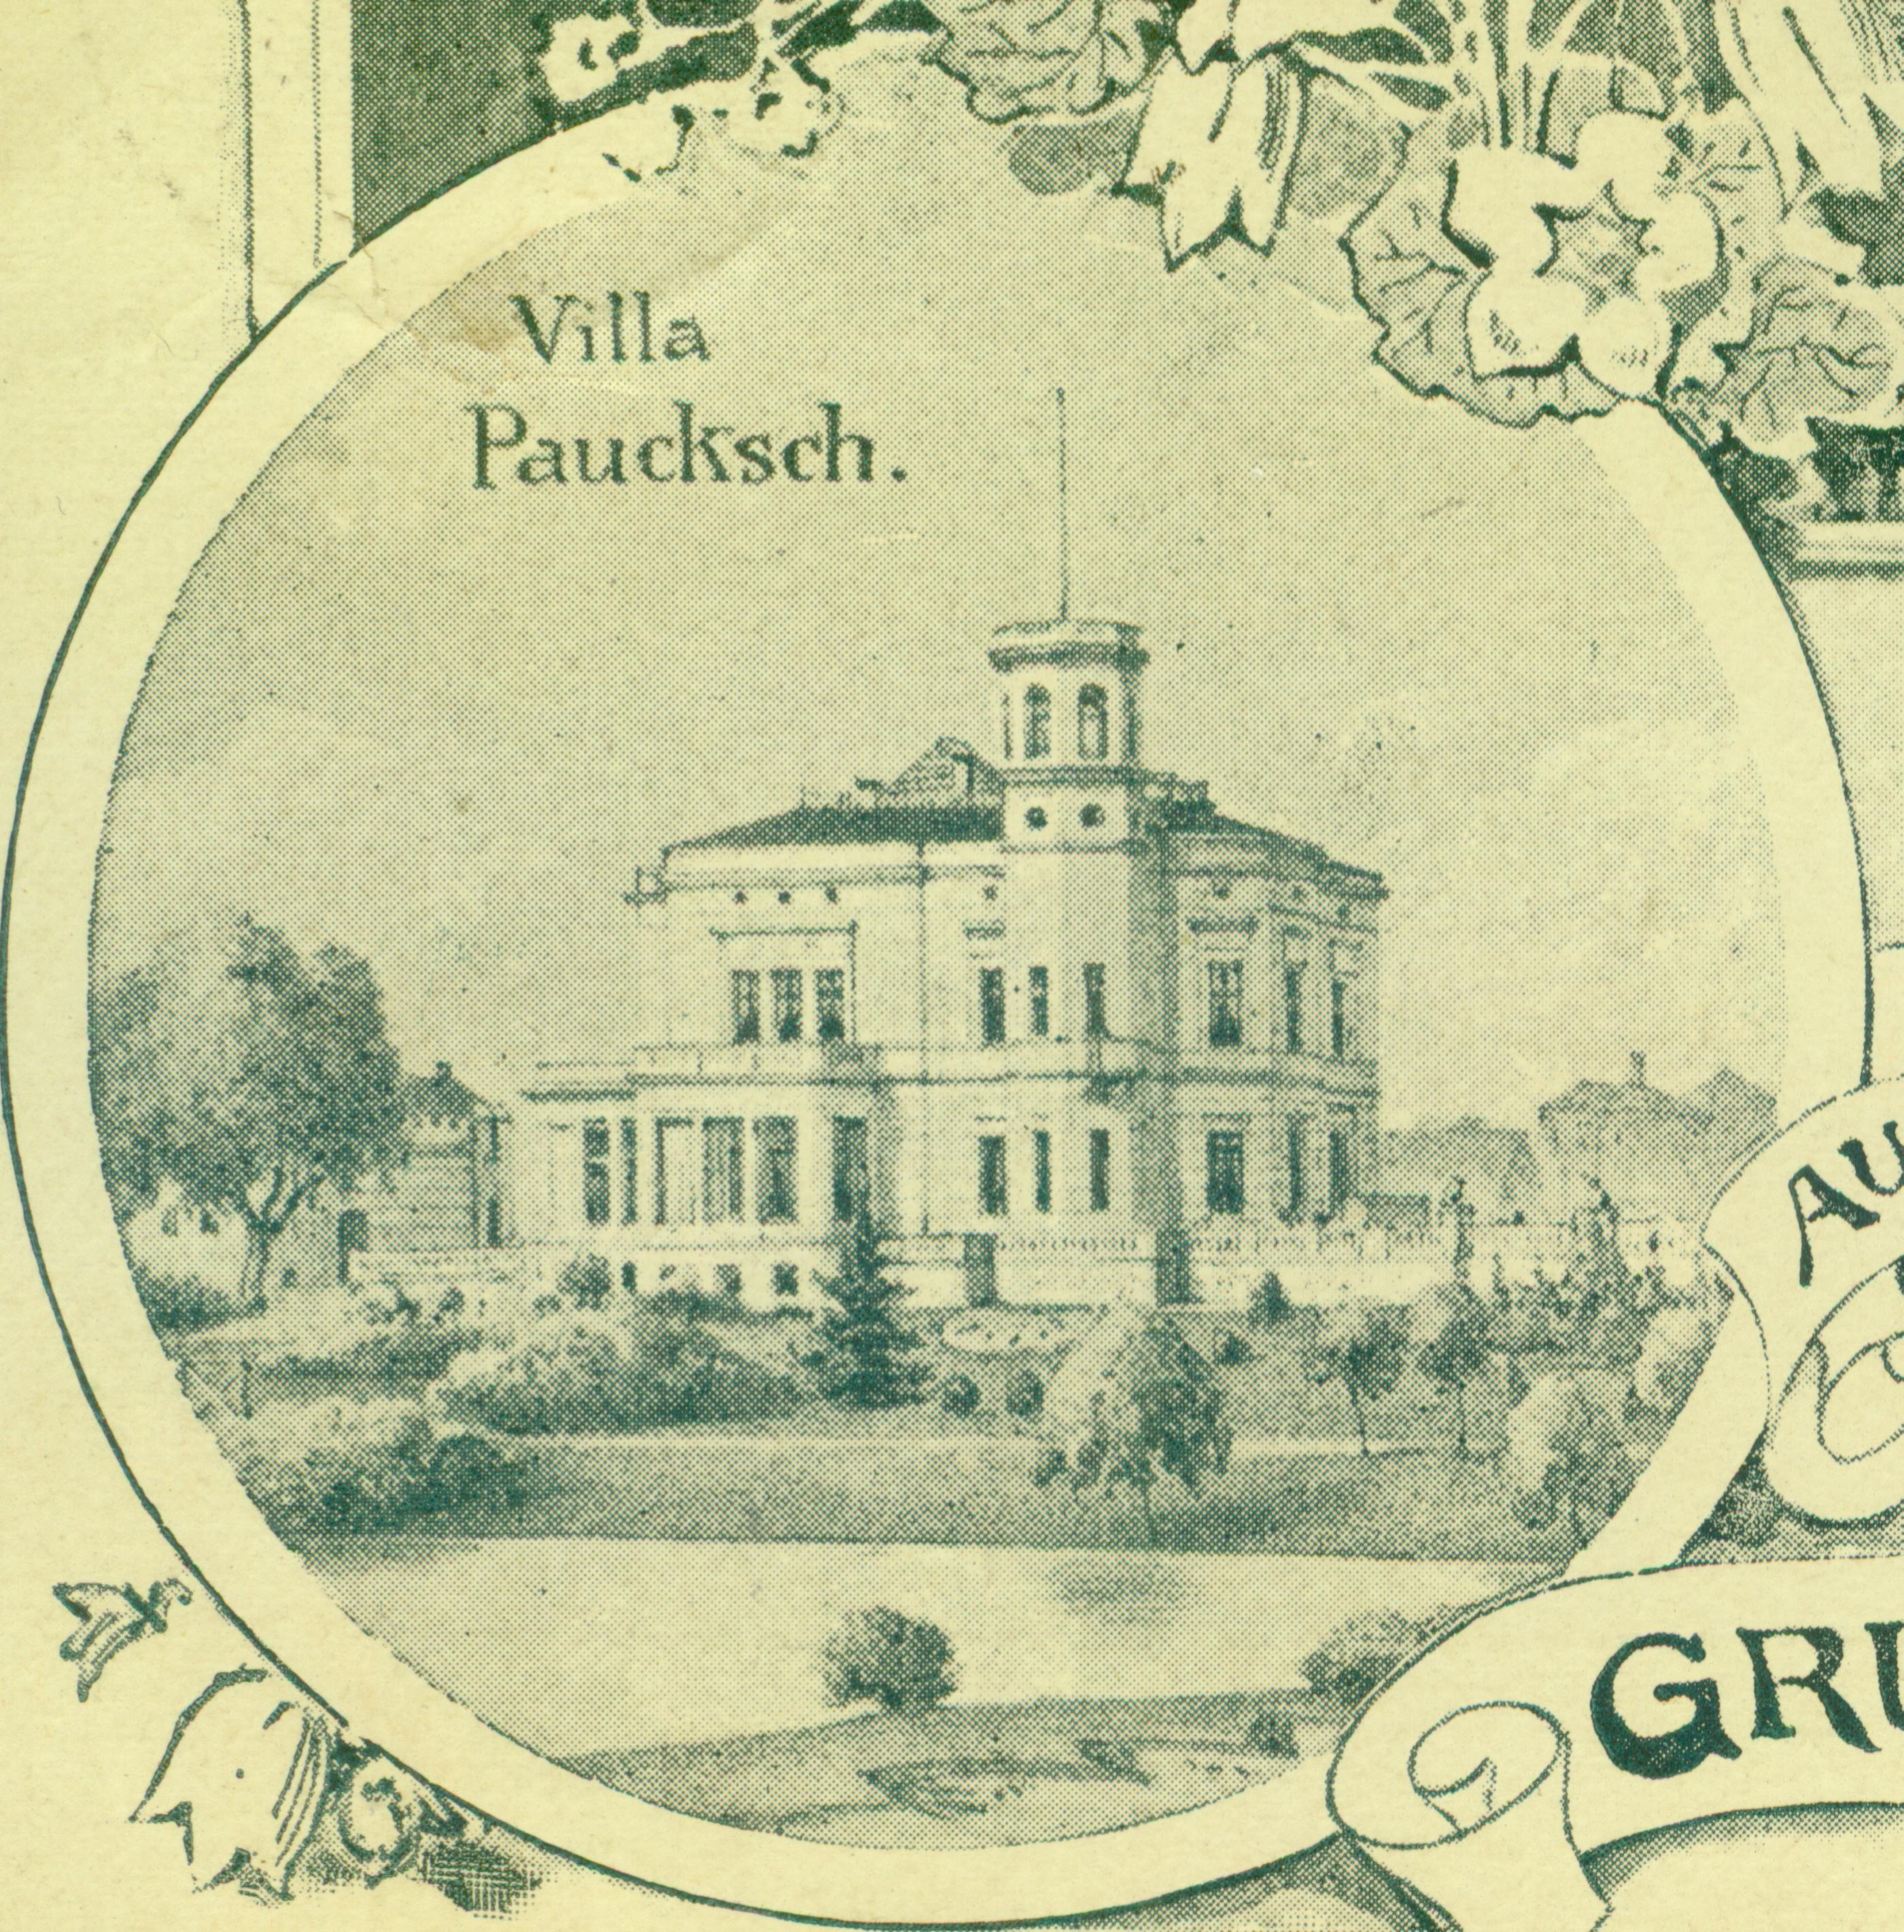 Gorzów-willa Paucksch